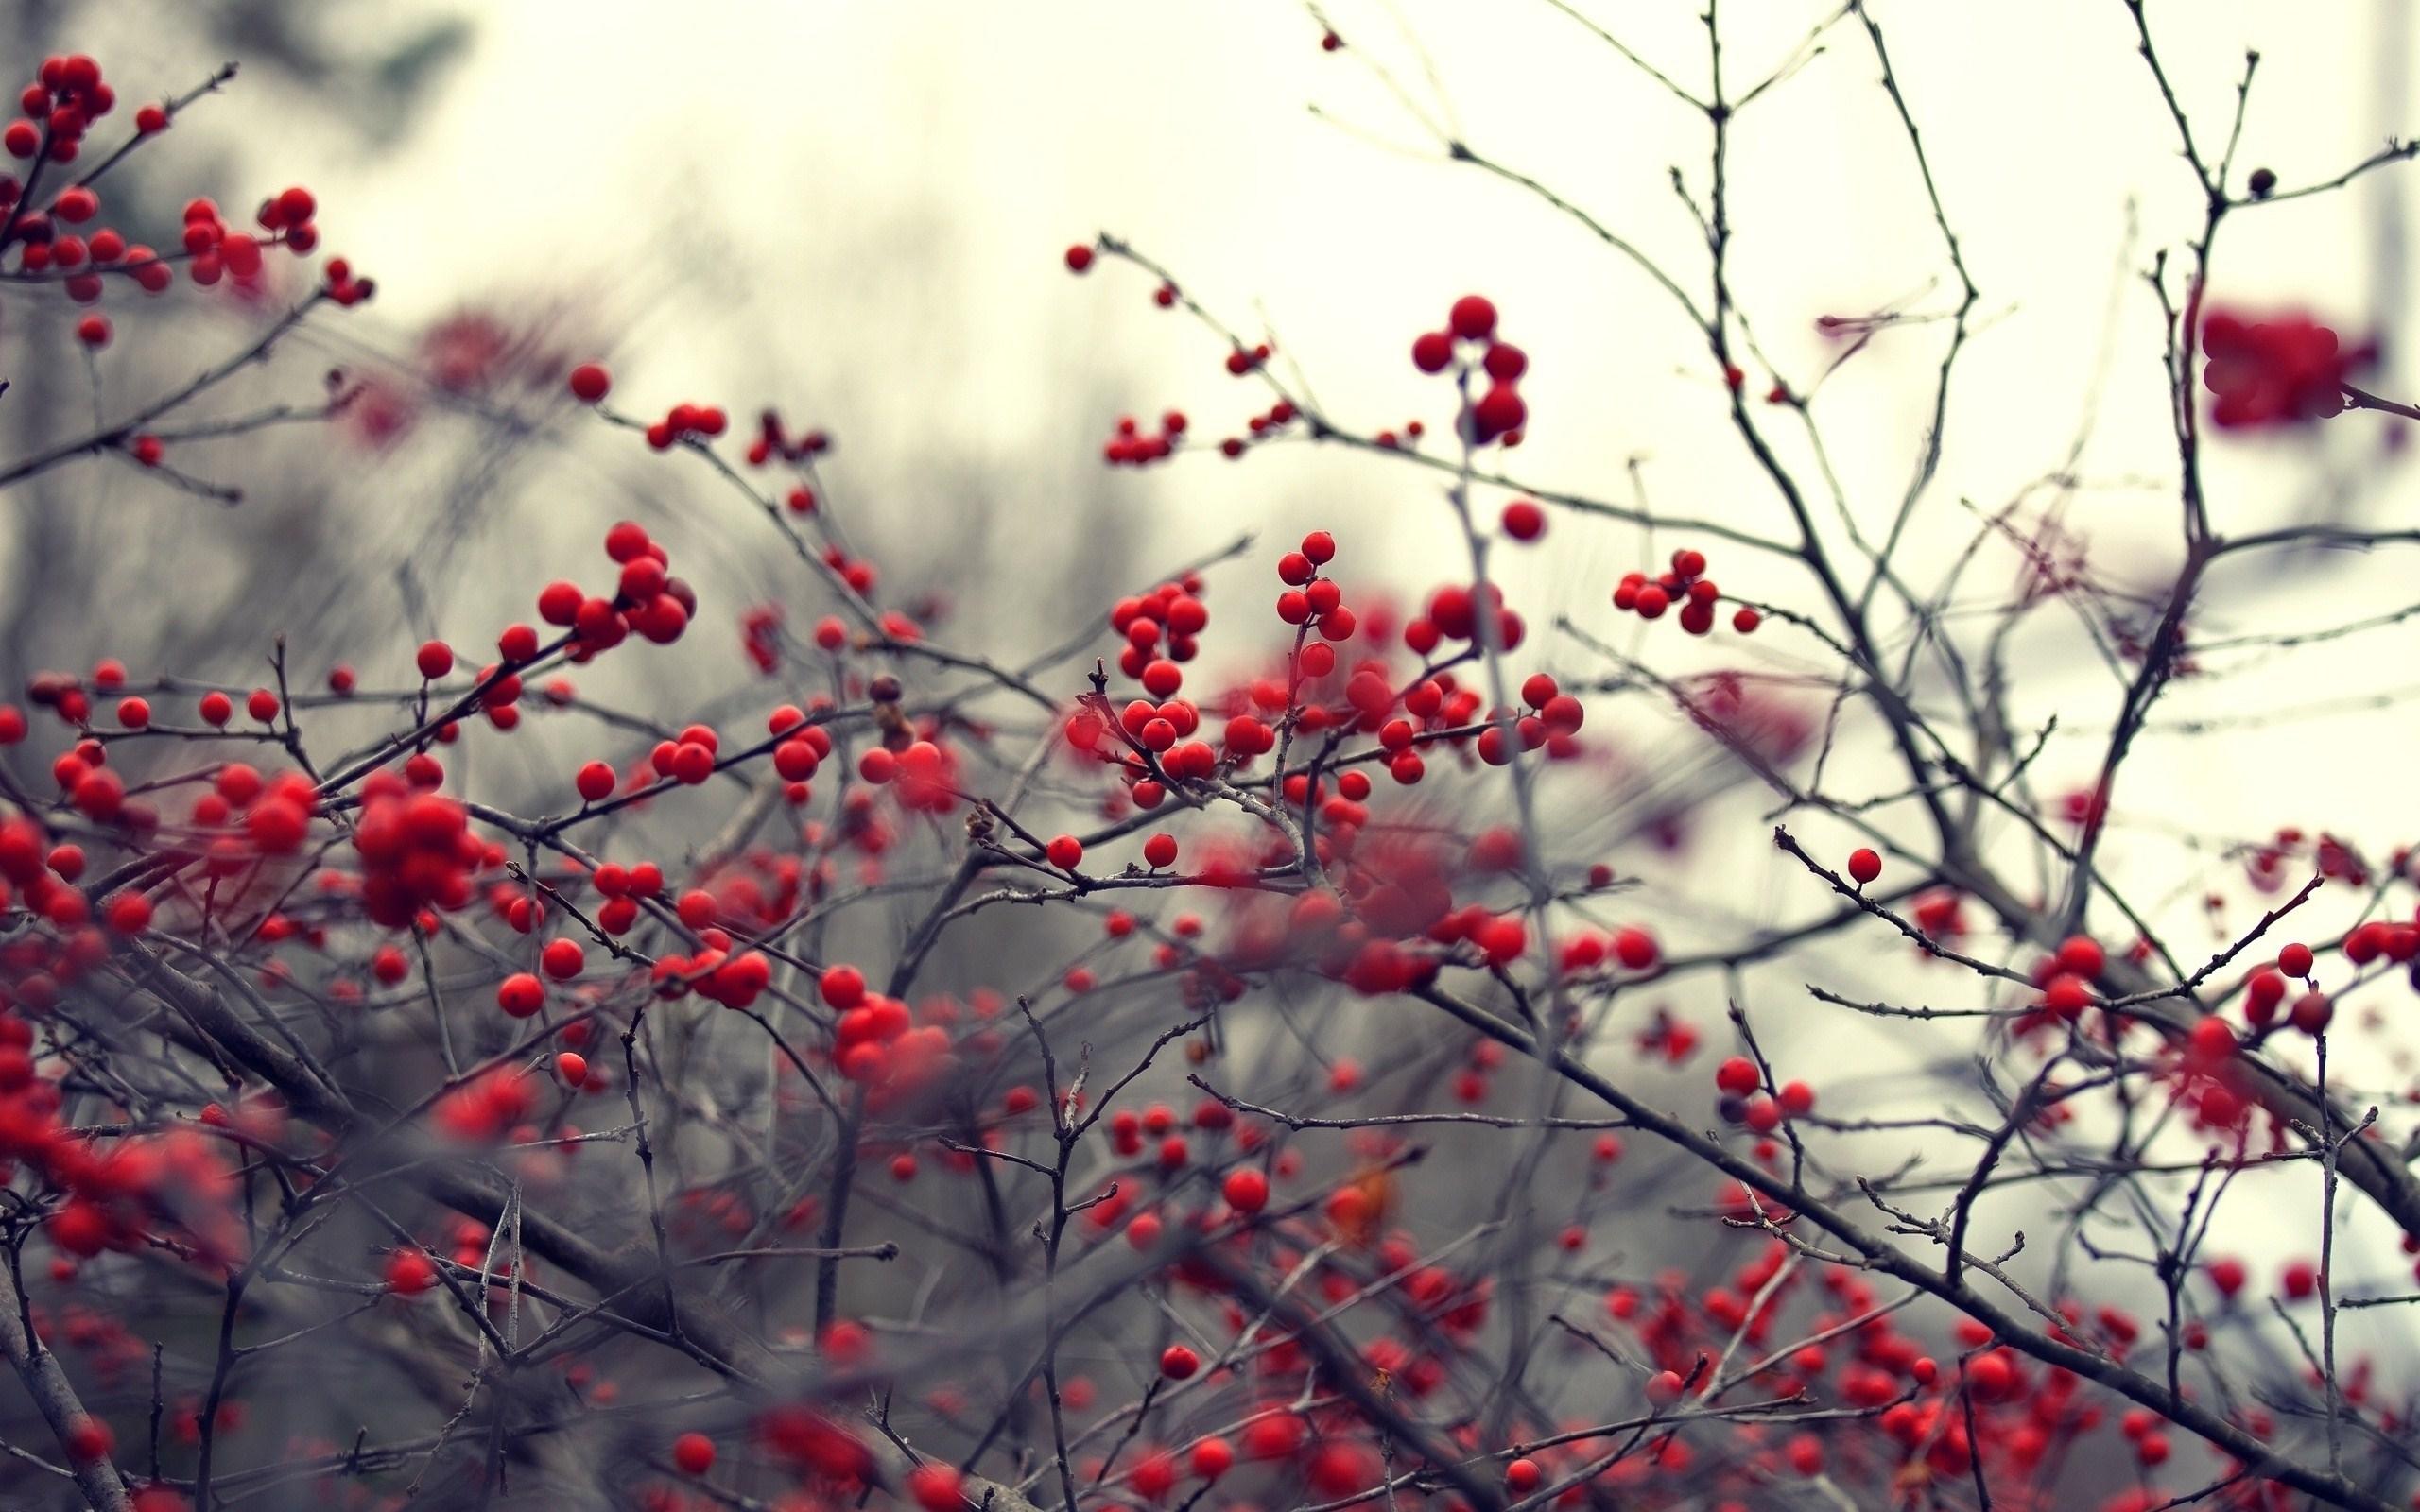 Nature Branches Red Berries Hd Wallpaper Wallpaper List 2560x1600